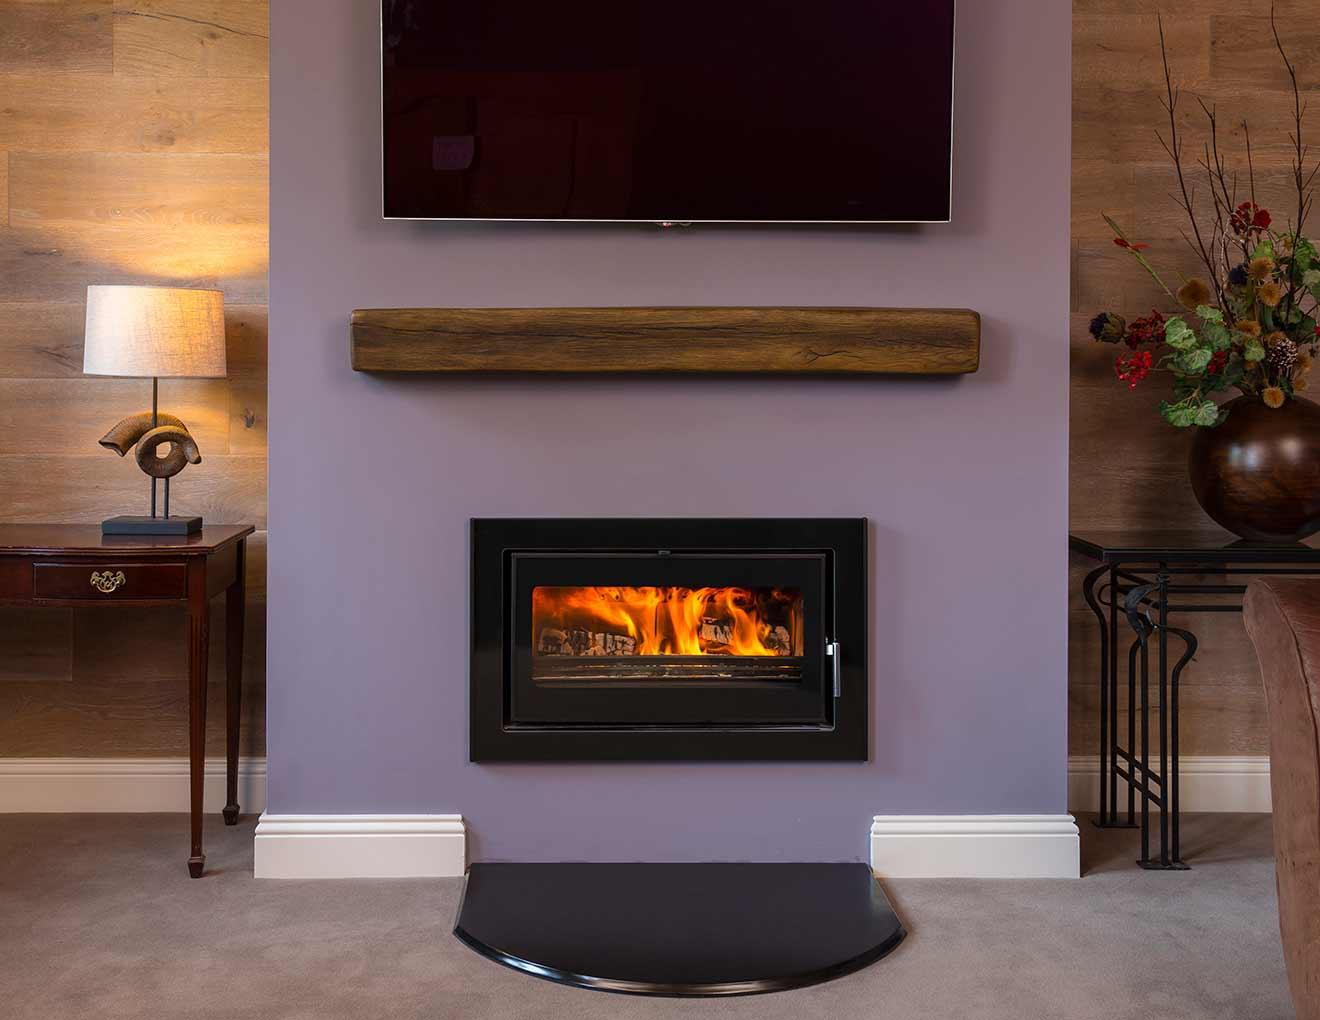 Inset Fireplace Inspirational Cassette Stoves Wood Burning & Multi Fuel Dublin